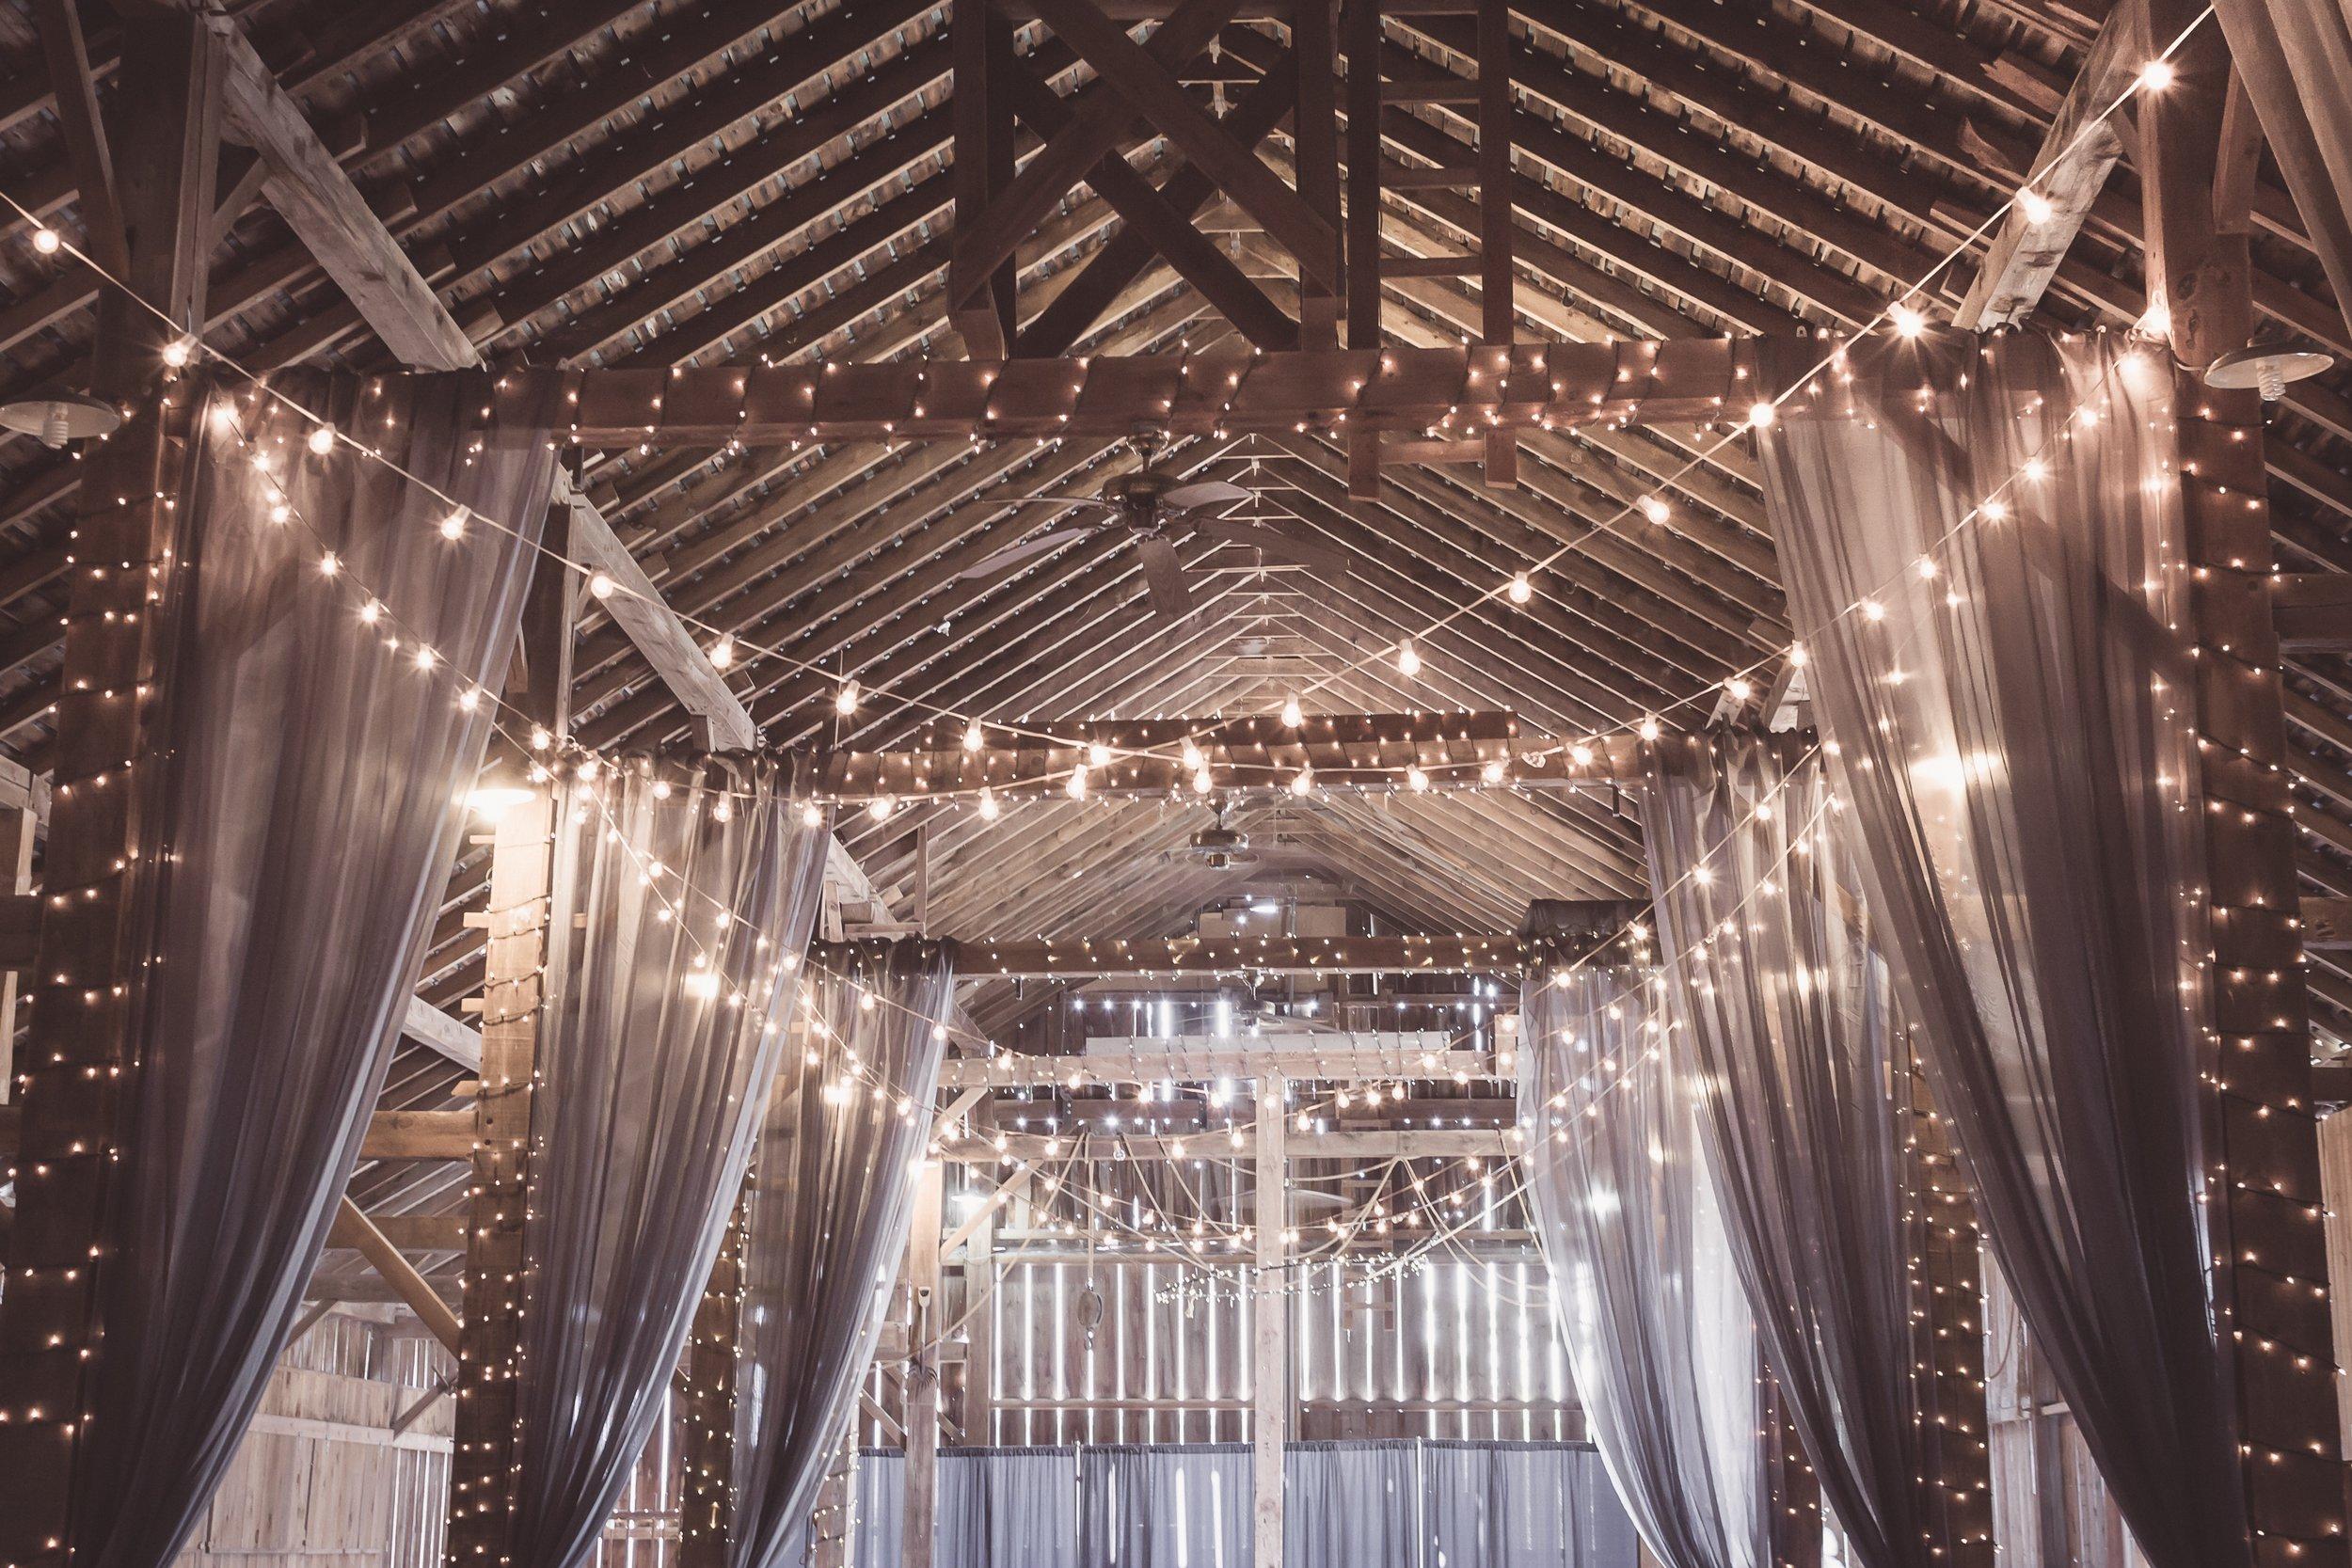 shelly-pence-662726-unsplash wedding barn.jpg